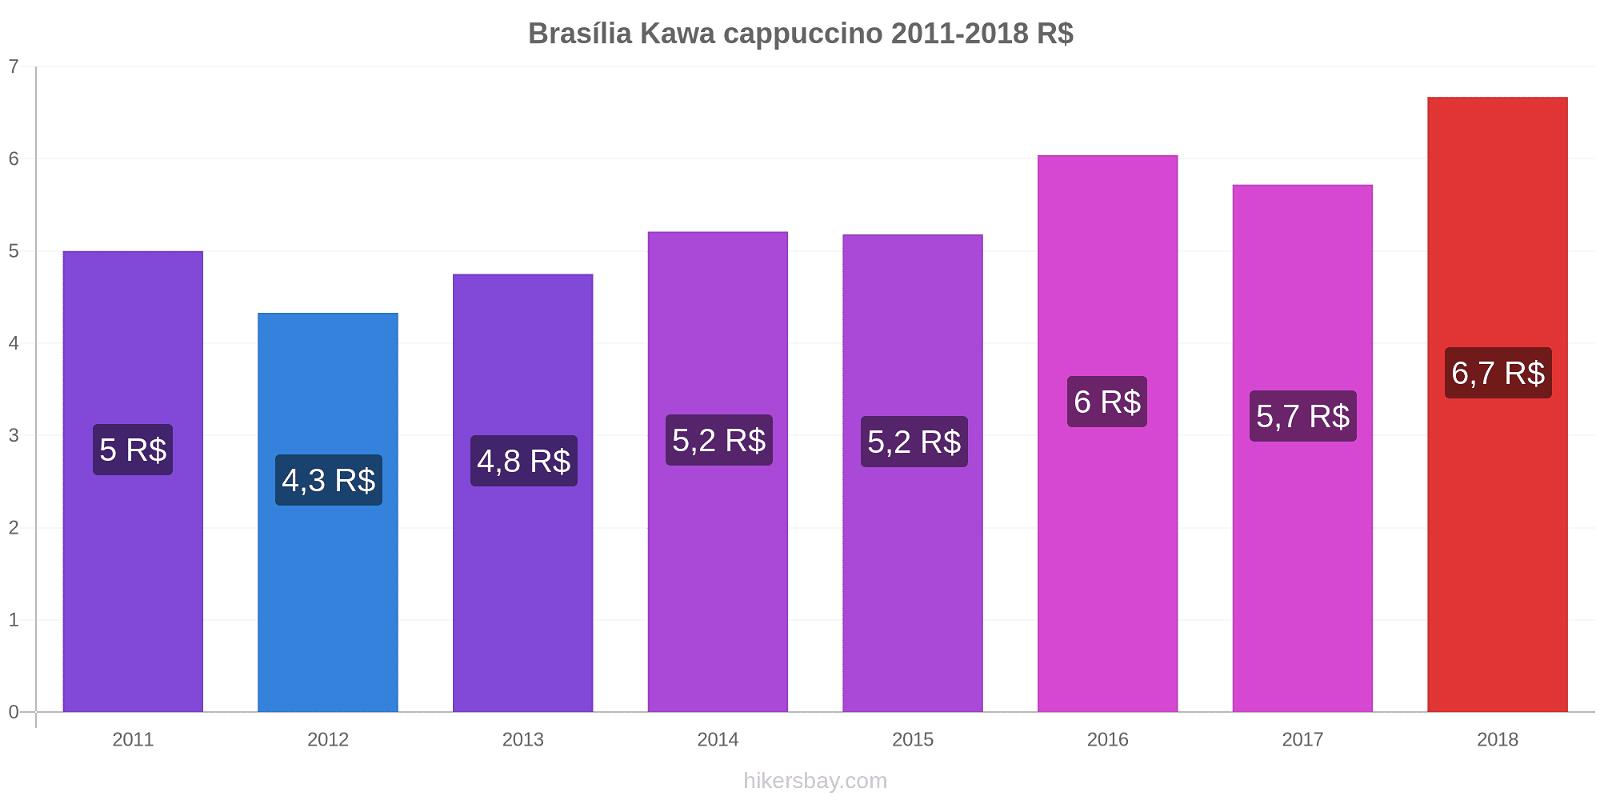 Brasília zmiany cen Kawa cappuccino hikersbay.com